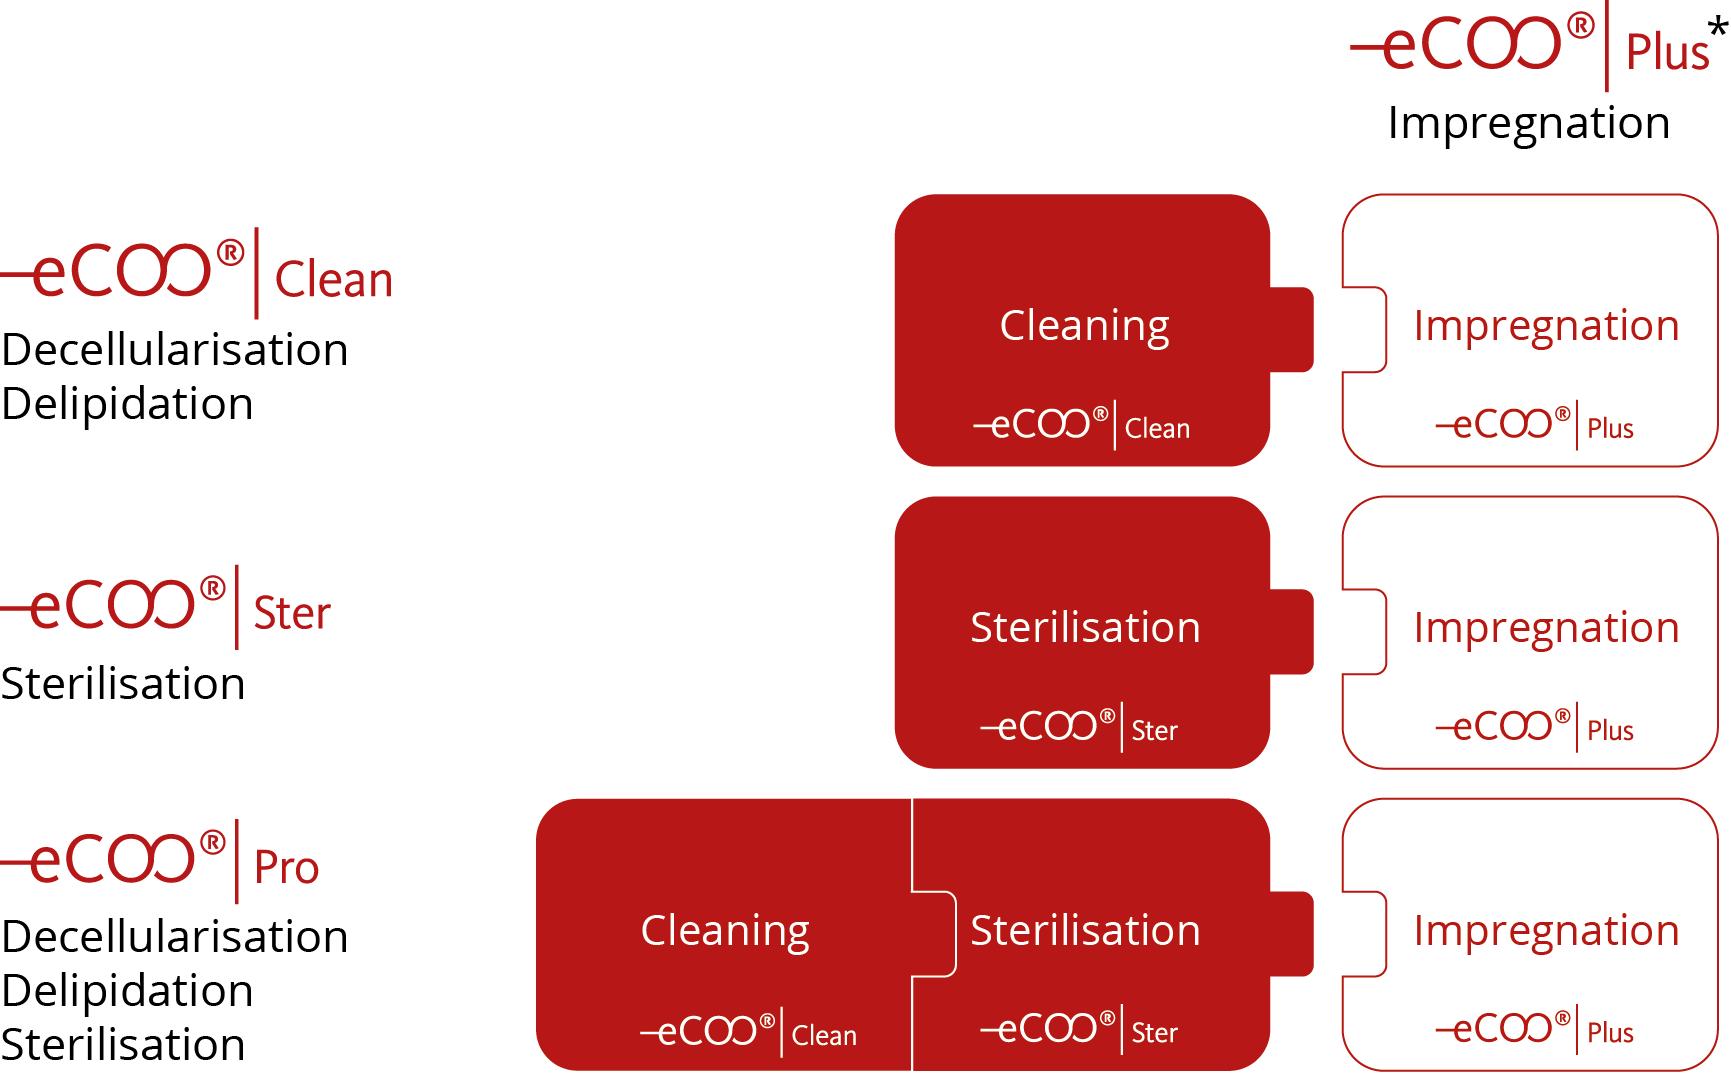 eCOO® Technology platform